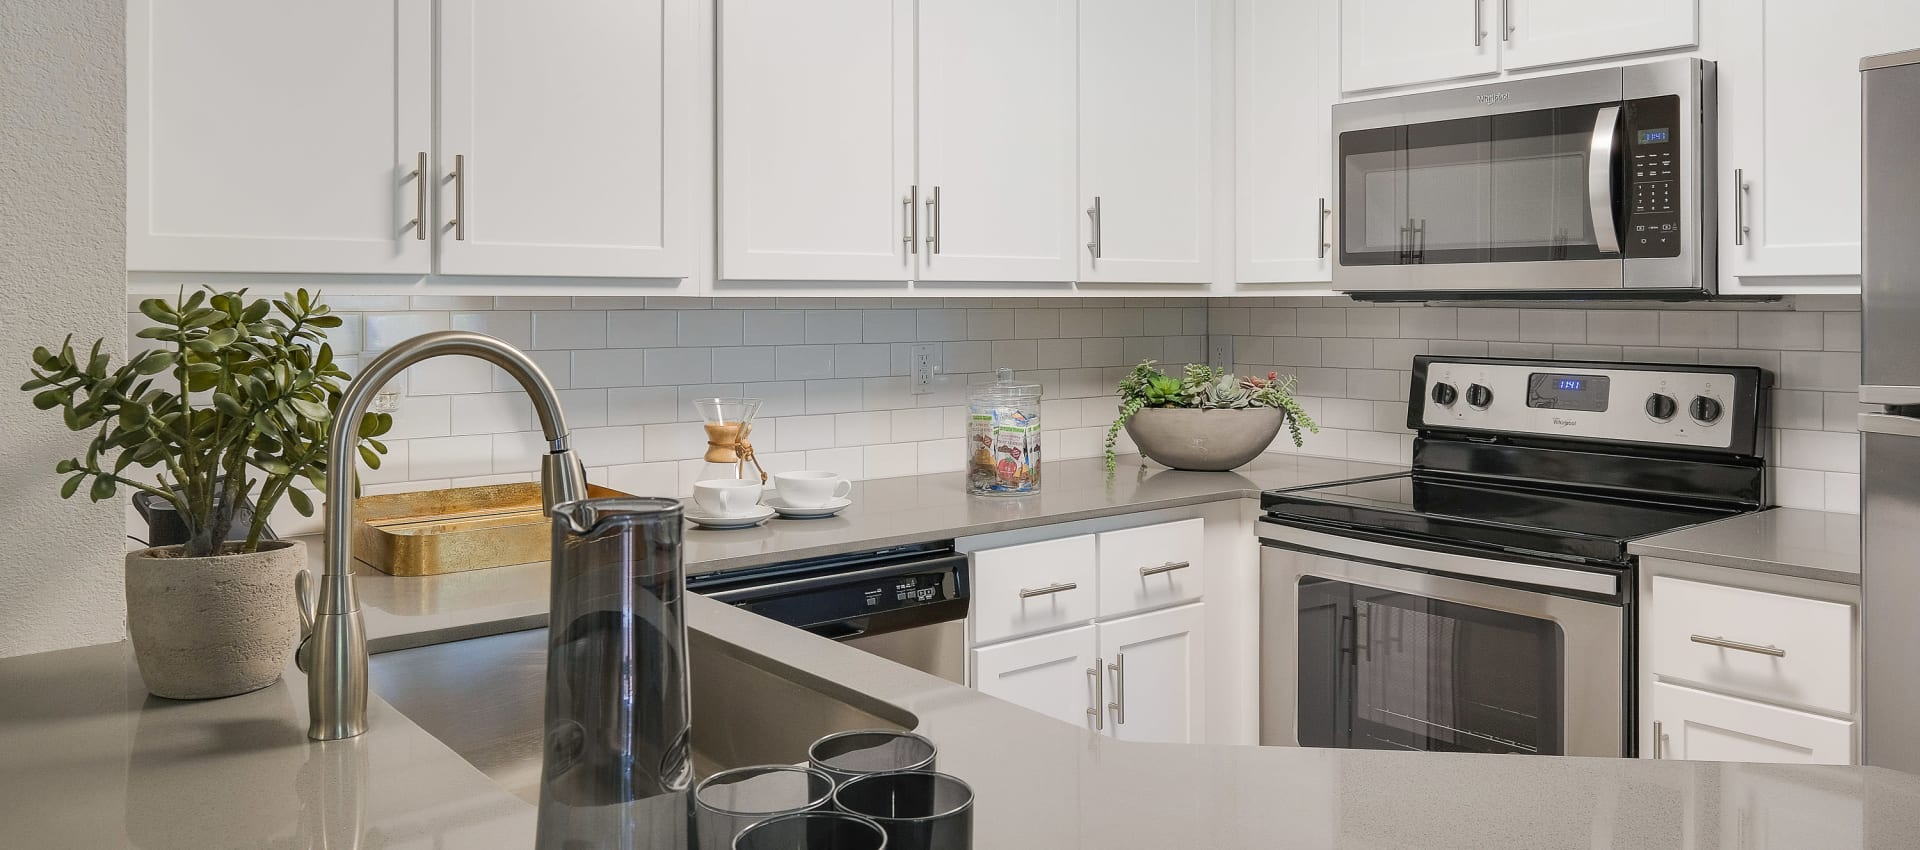 Kitchen at Centro Apartment Homes in Hillsboro, Oregon